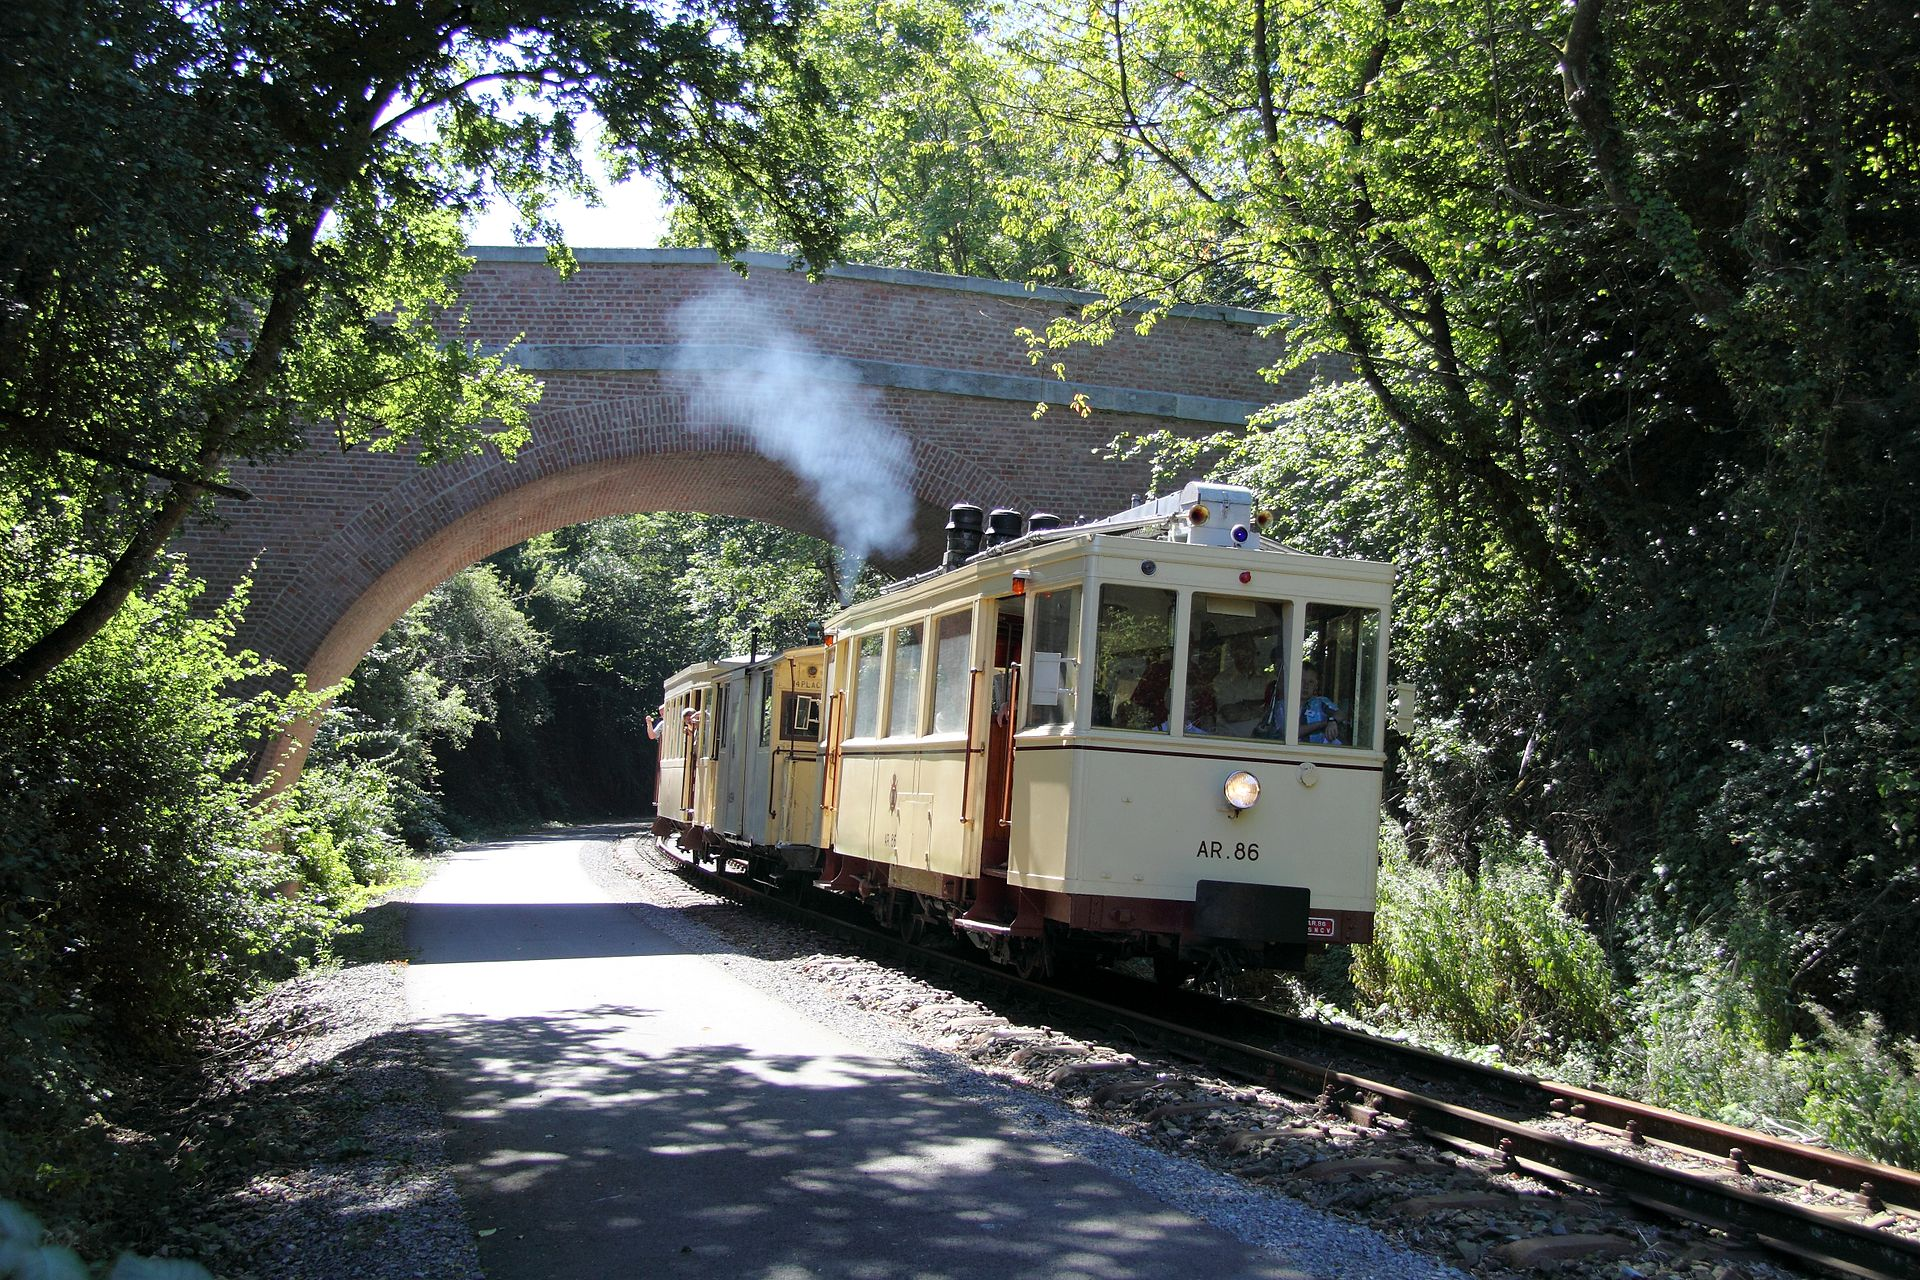 Tram Thuin - Lobbes